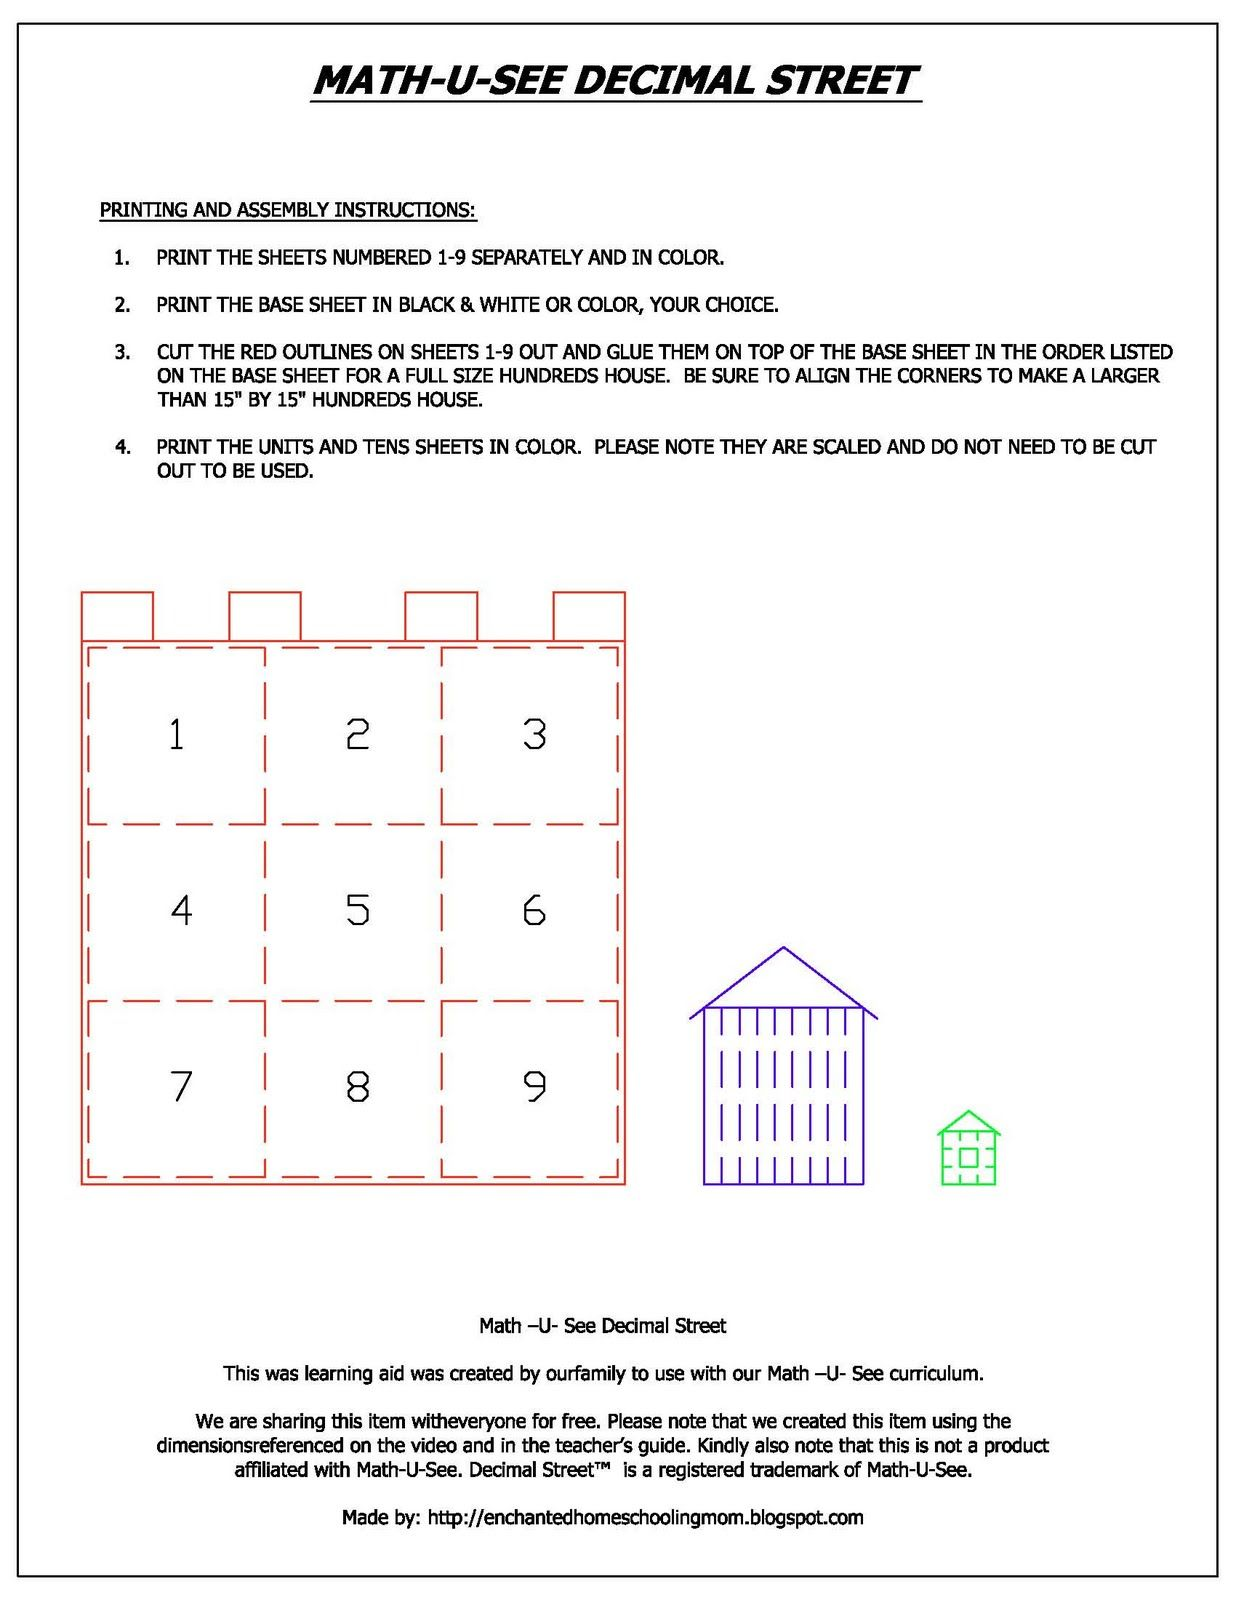 Enchanted Homeschooling Mom: Math U See Decimal Street Printable ...